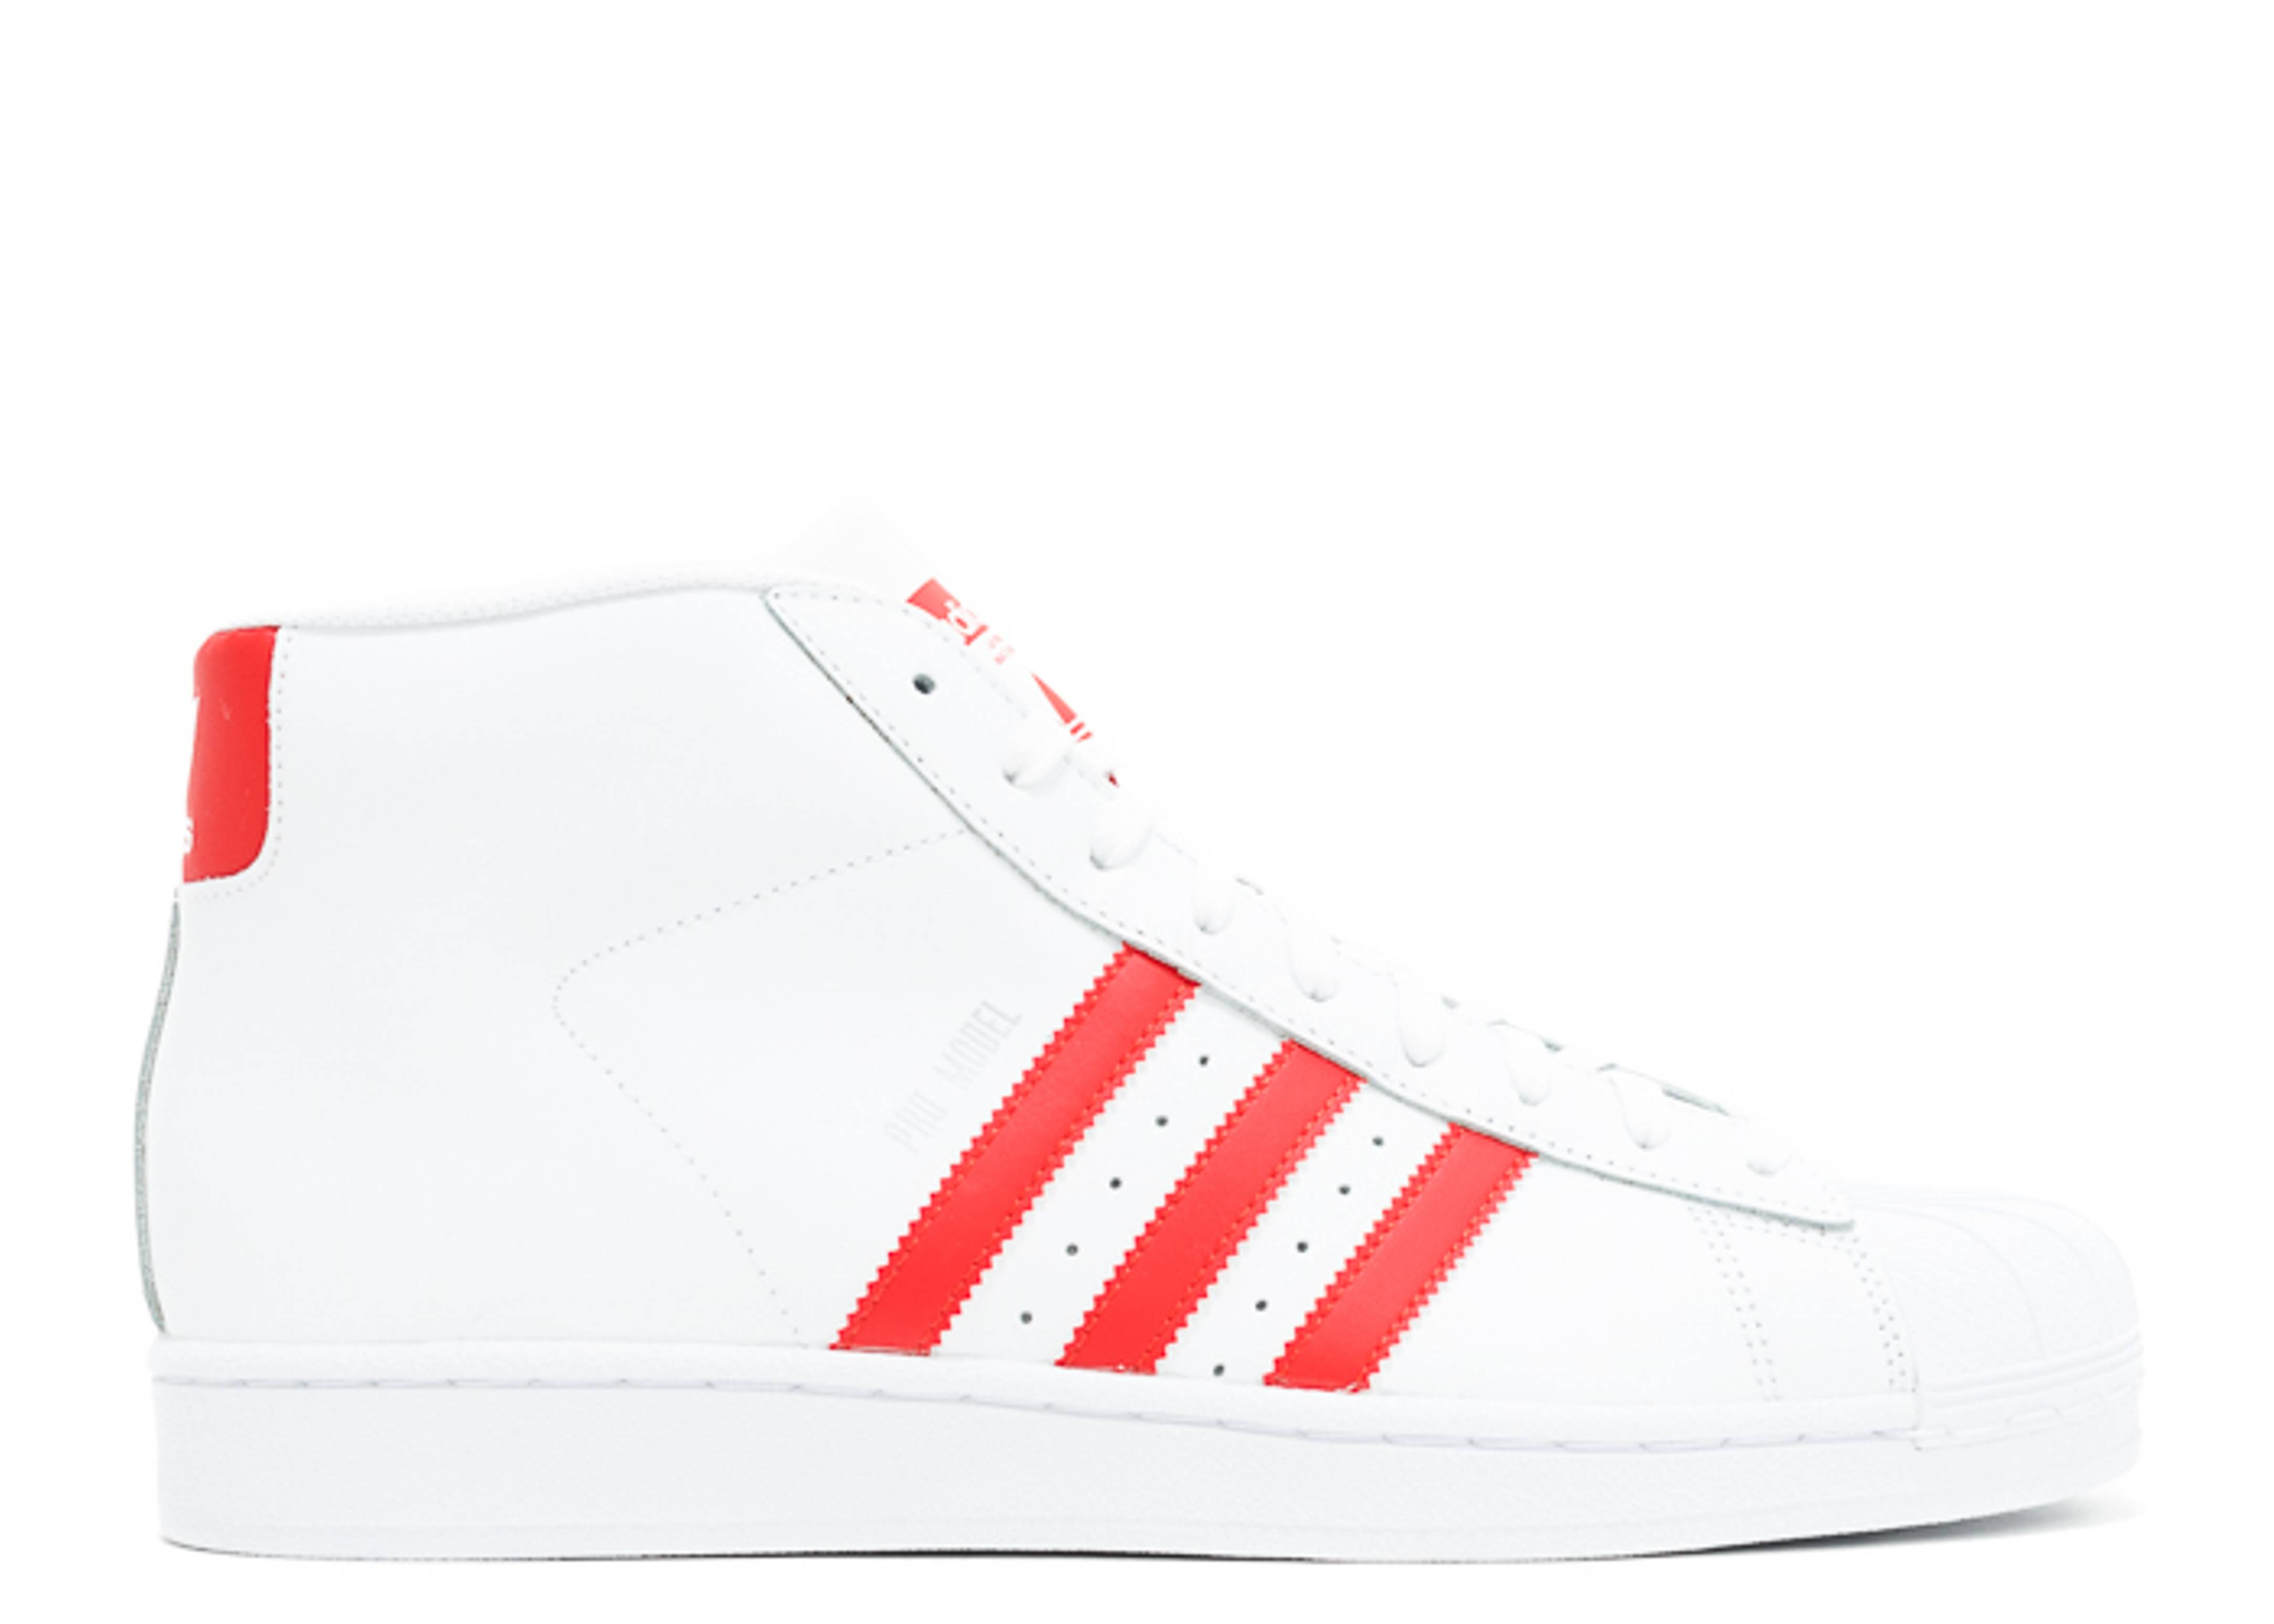 vite Terribile Equivalente  Pro Model - Adidas - S75928 - footwear white/red/footwear white   Flight  Club